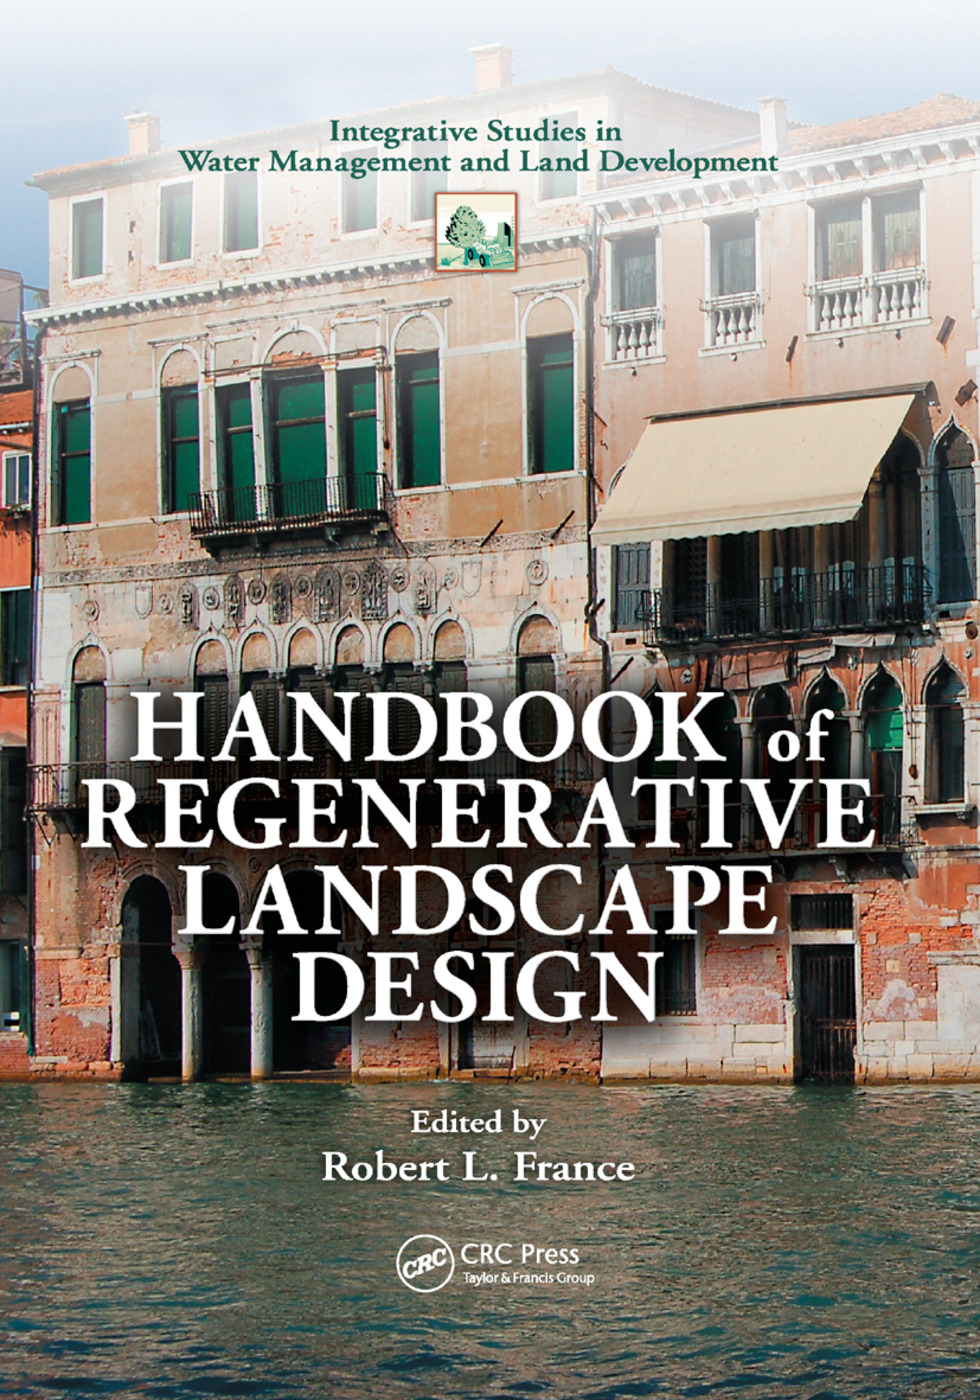 Handbook of Regenerative Landscape Design: 1st Edition (Paperback) book cover